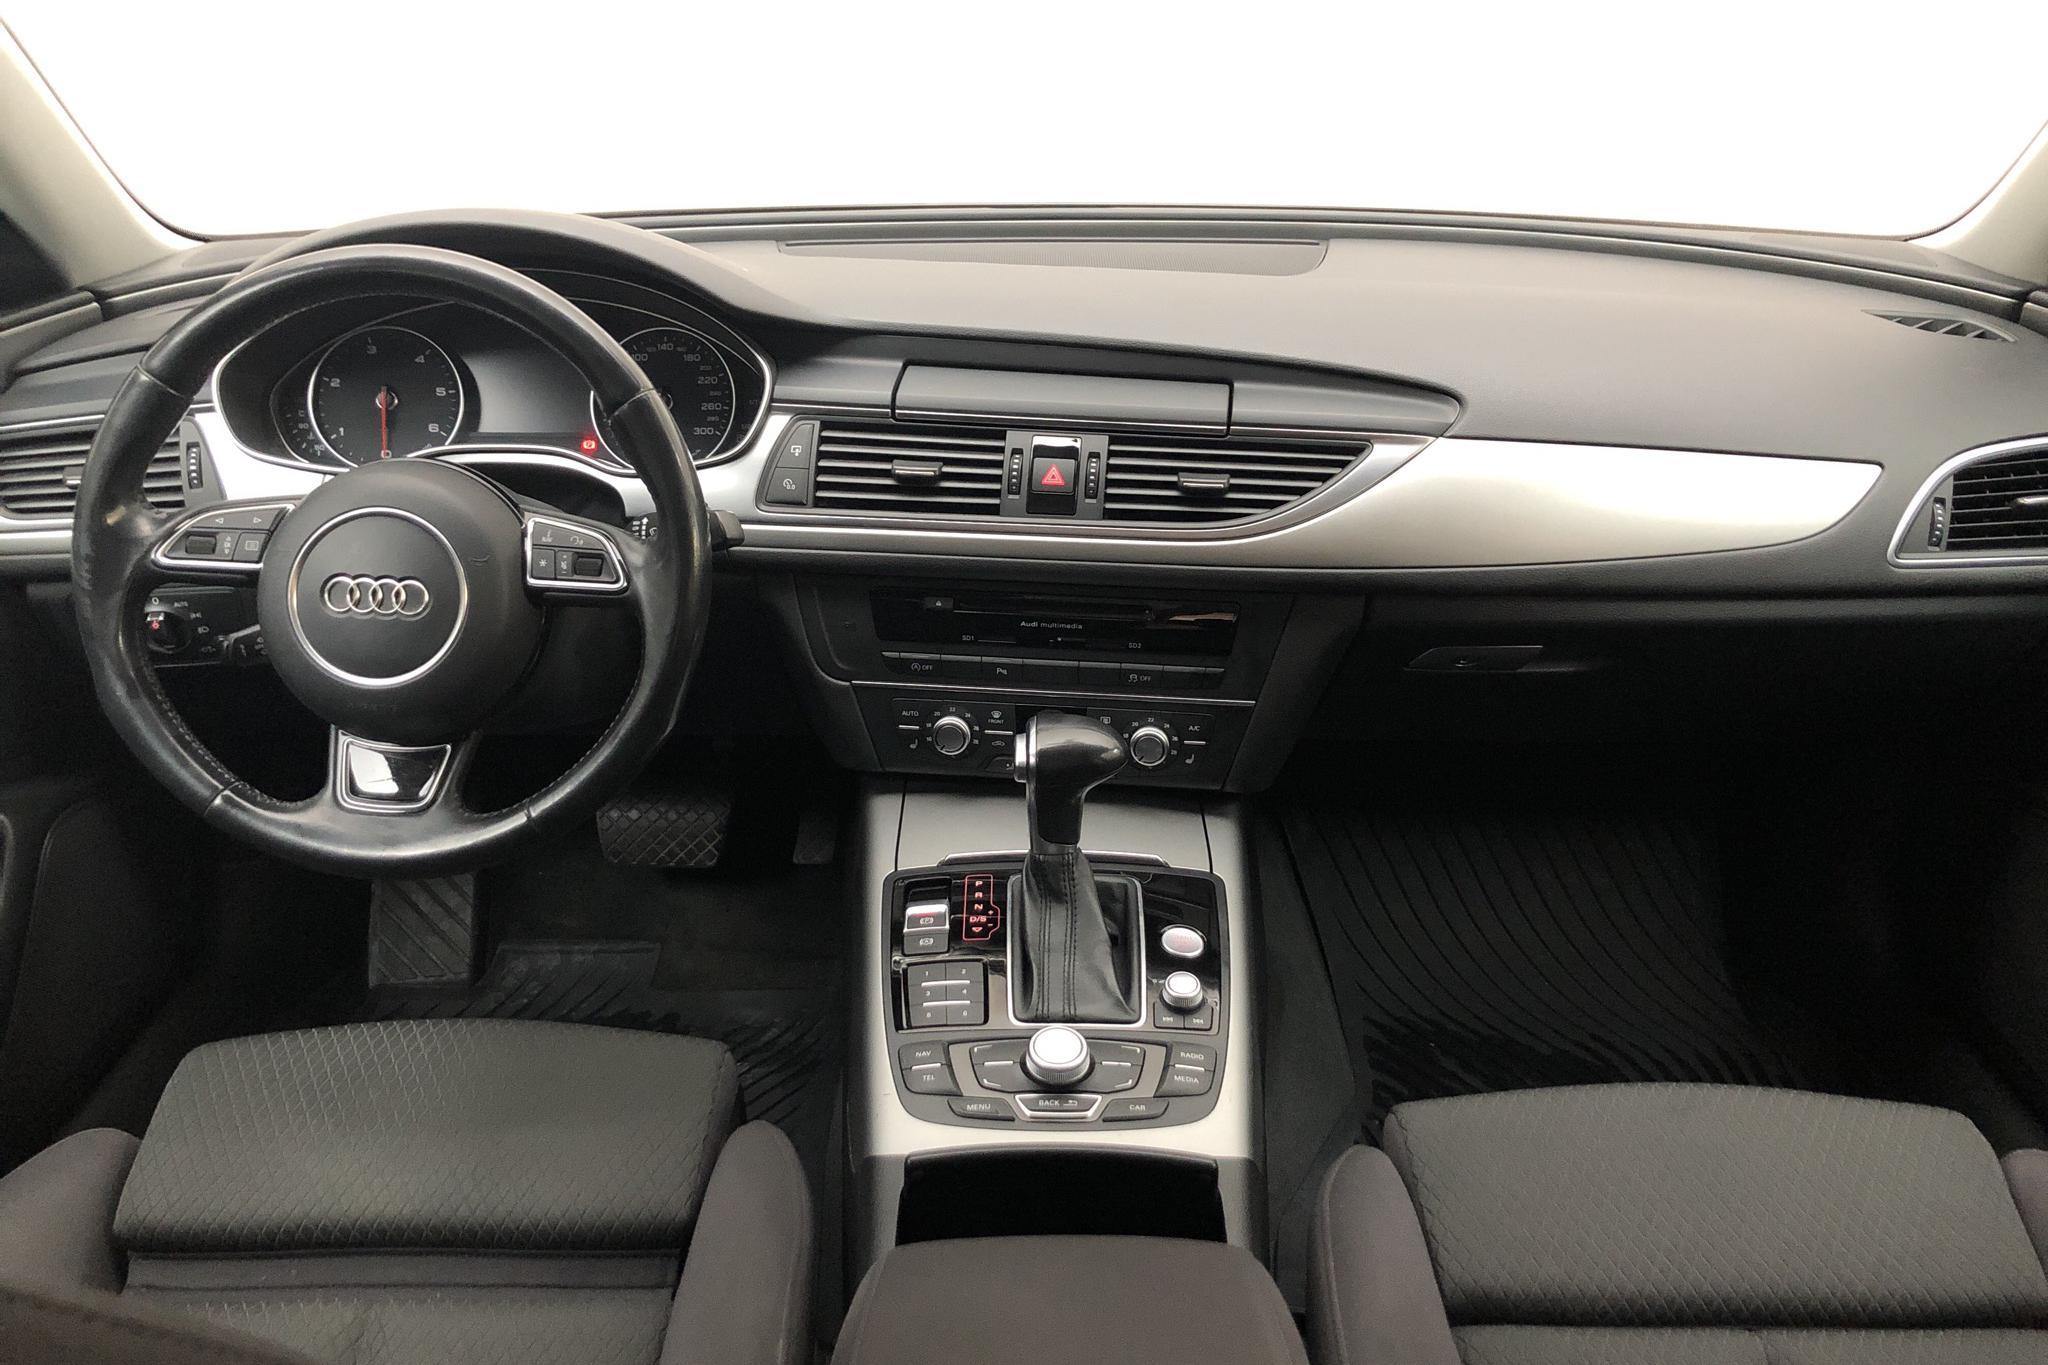 Audi A6 2.0 TDI Ultra Avant (190hk) - 12 975 mil - Automat - svart - 2014